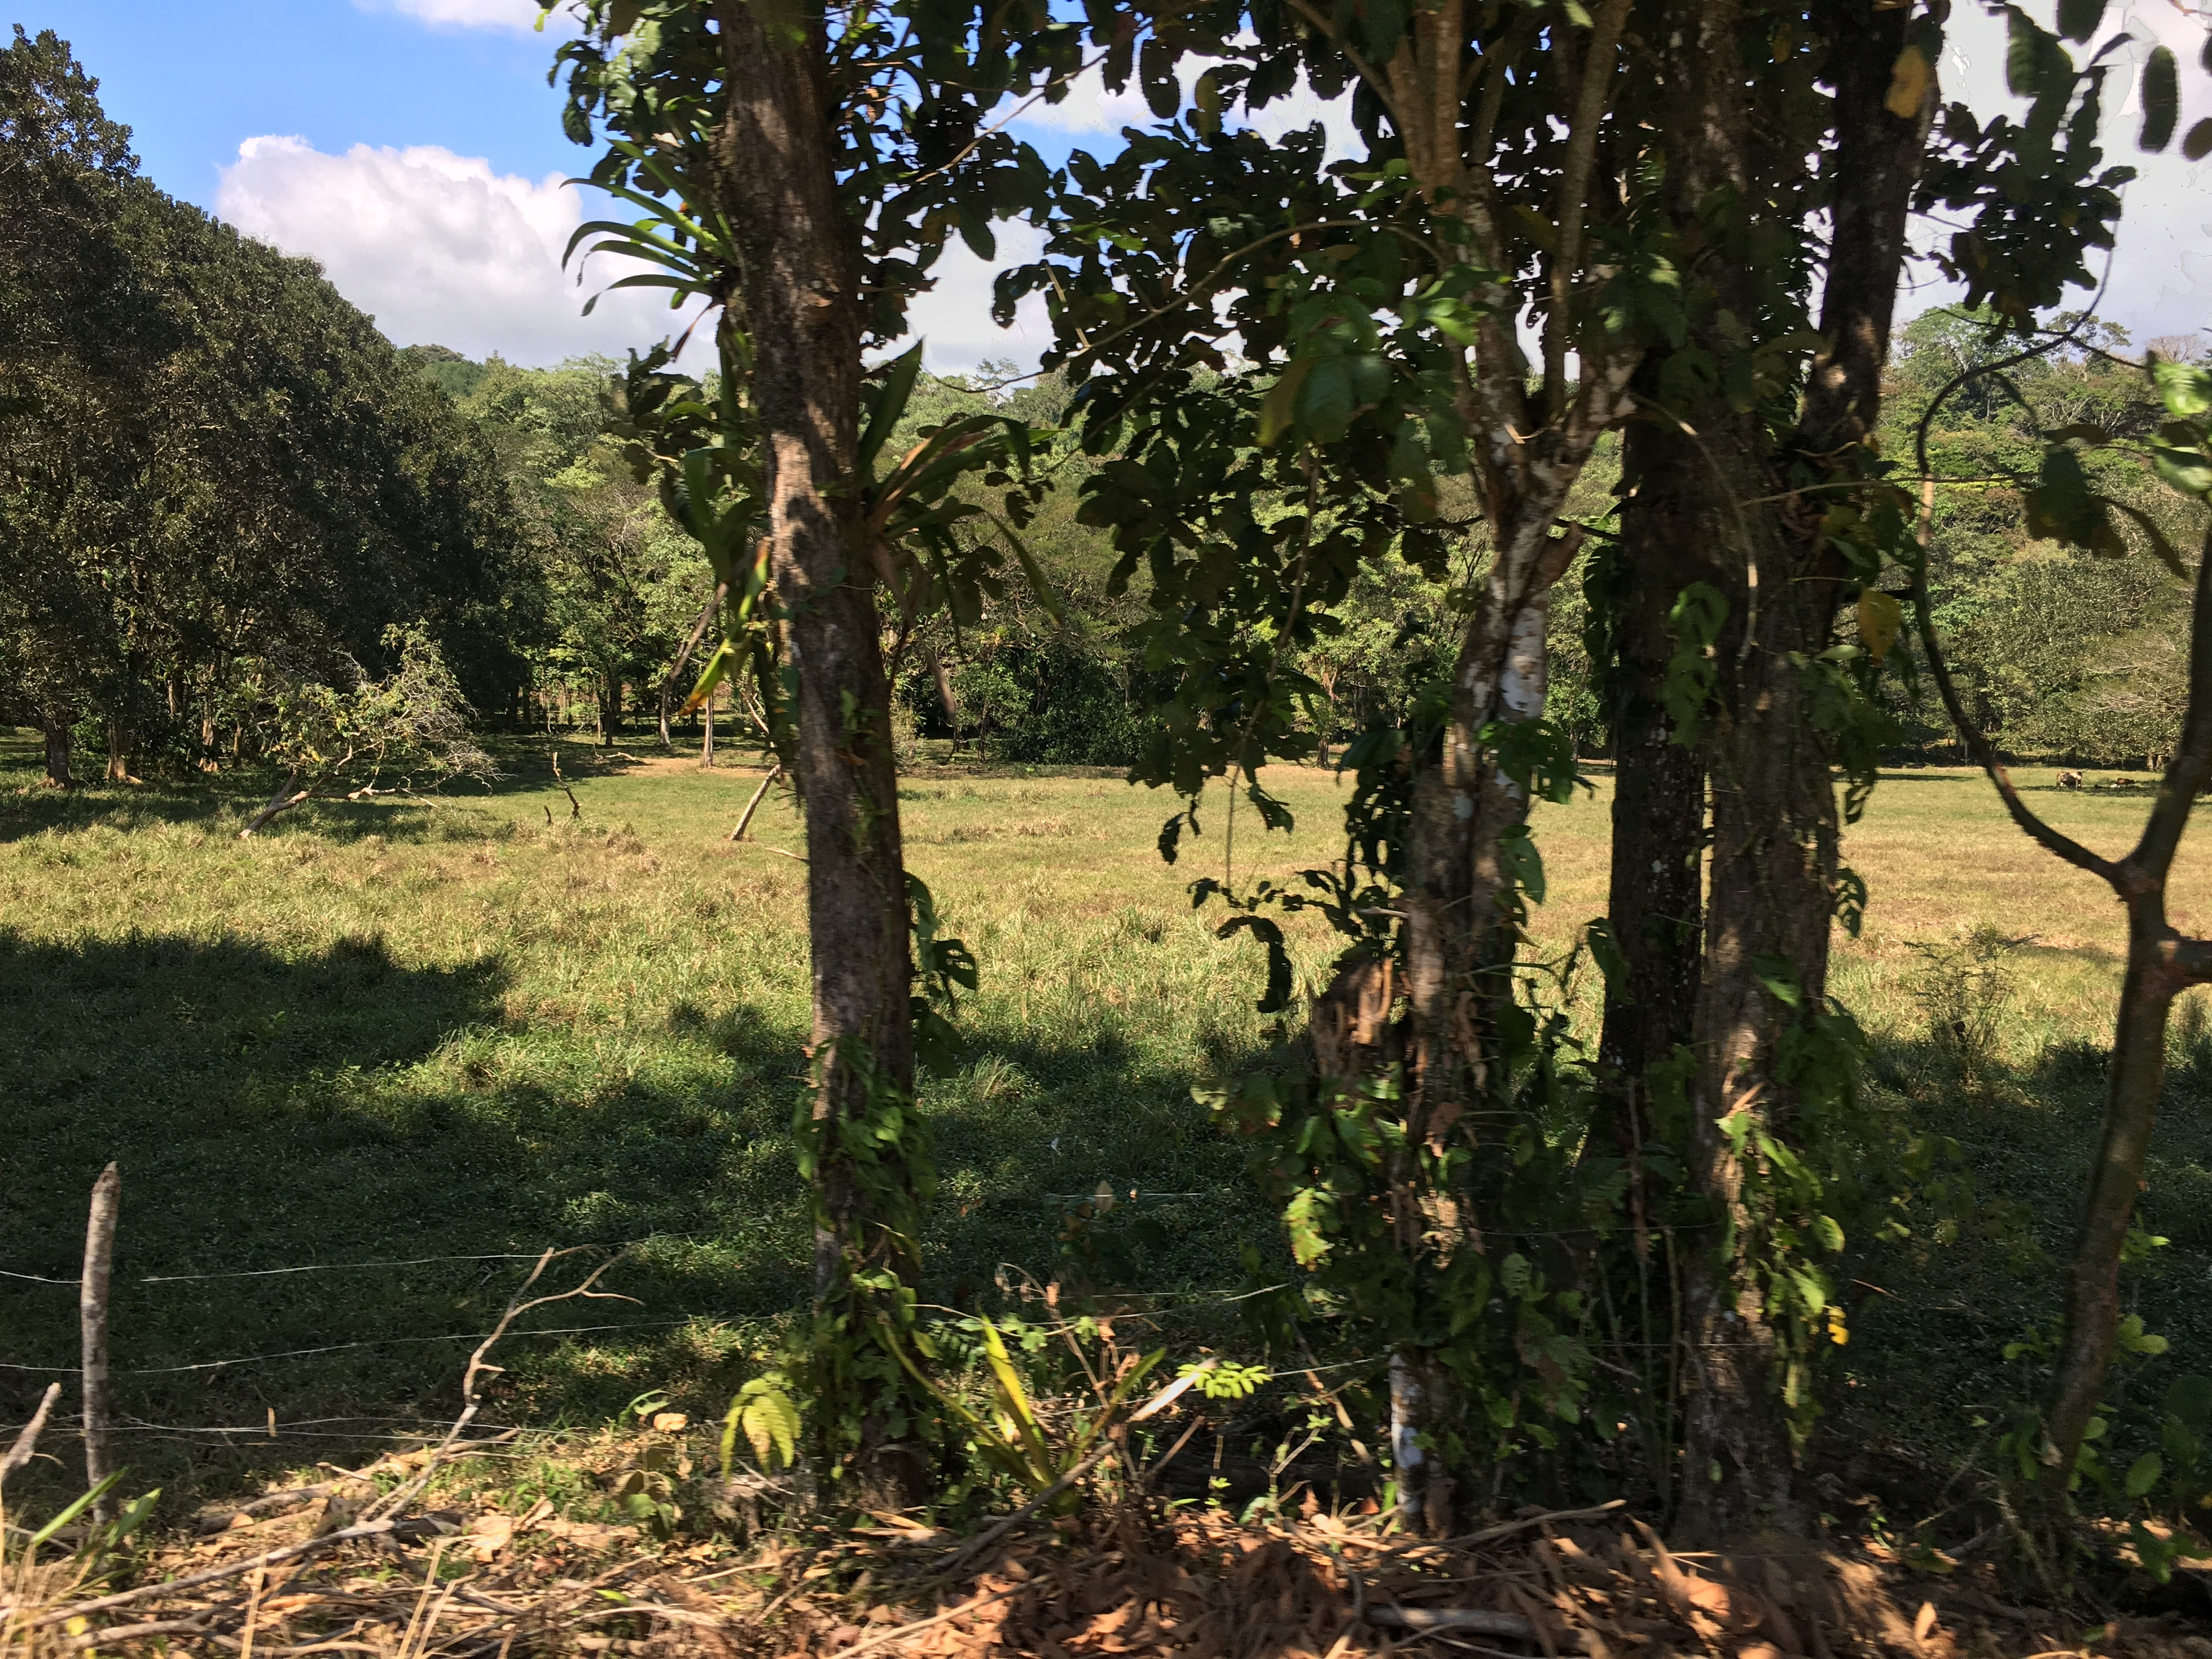 Dominical-Costa-Rica-property-costaricarealestateDOM331-5.jpg